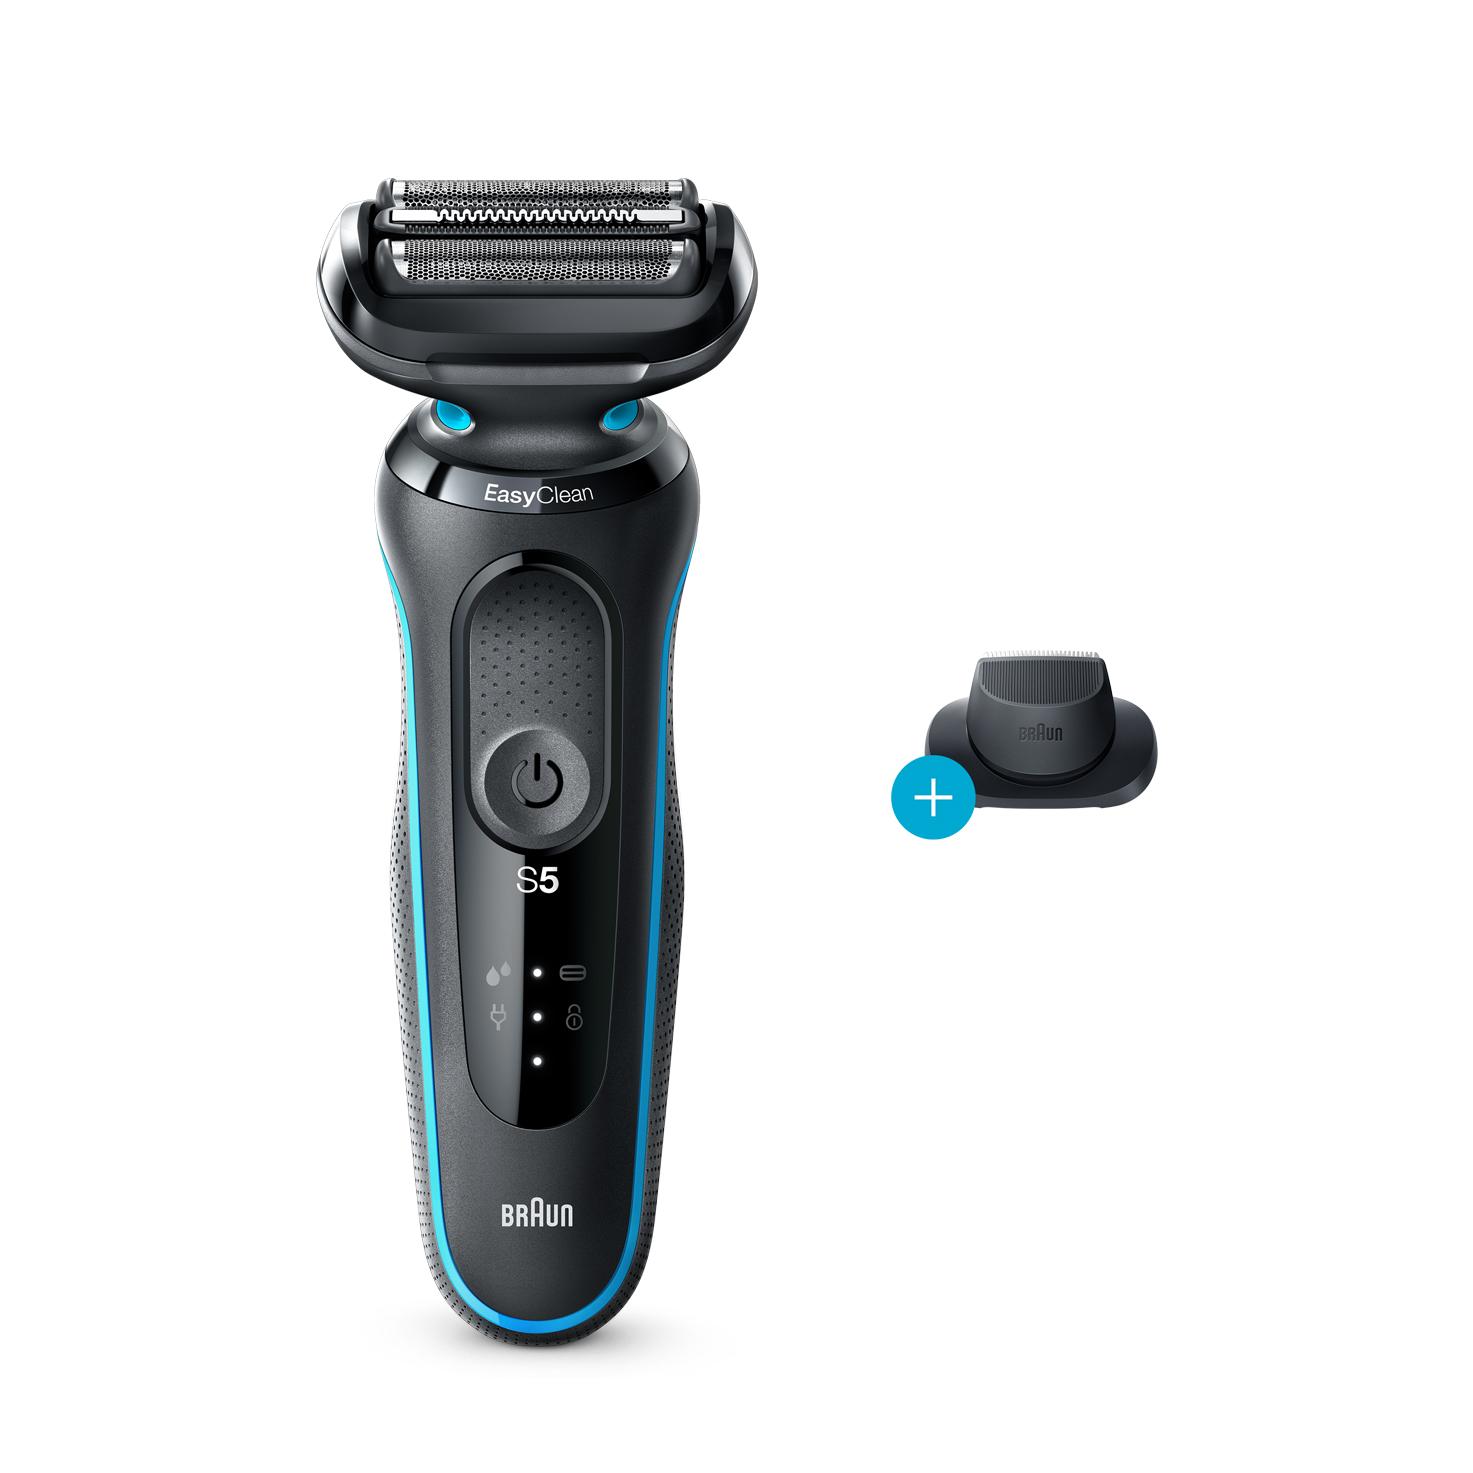 Braun - Series 5 50-M1200s Wet & Dry Shaver